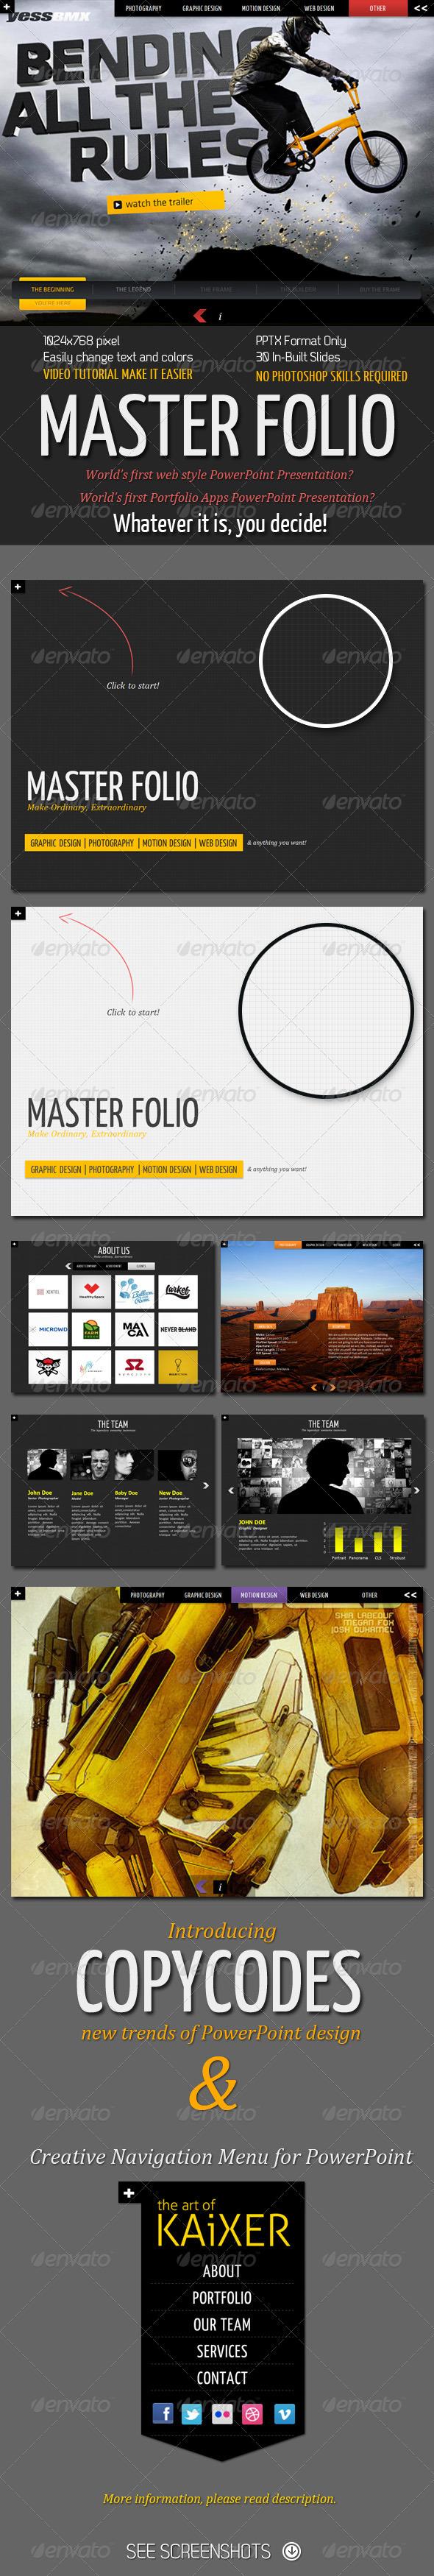 GraphicRiver Master Folio PowerPoint Presentation 300883